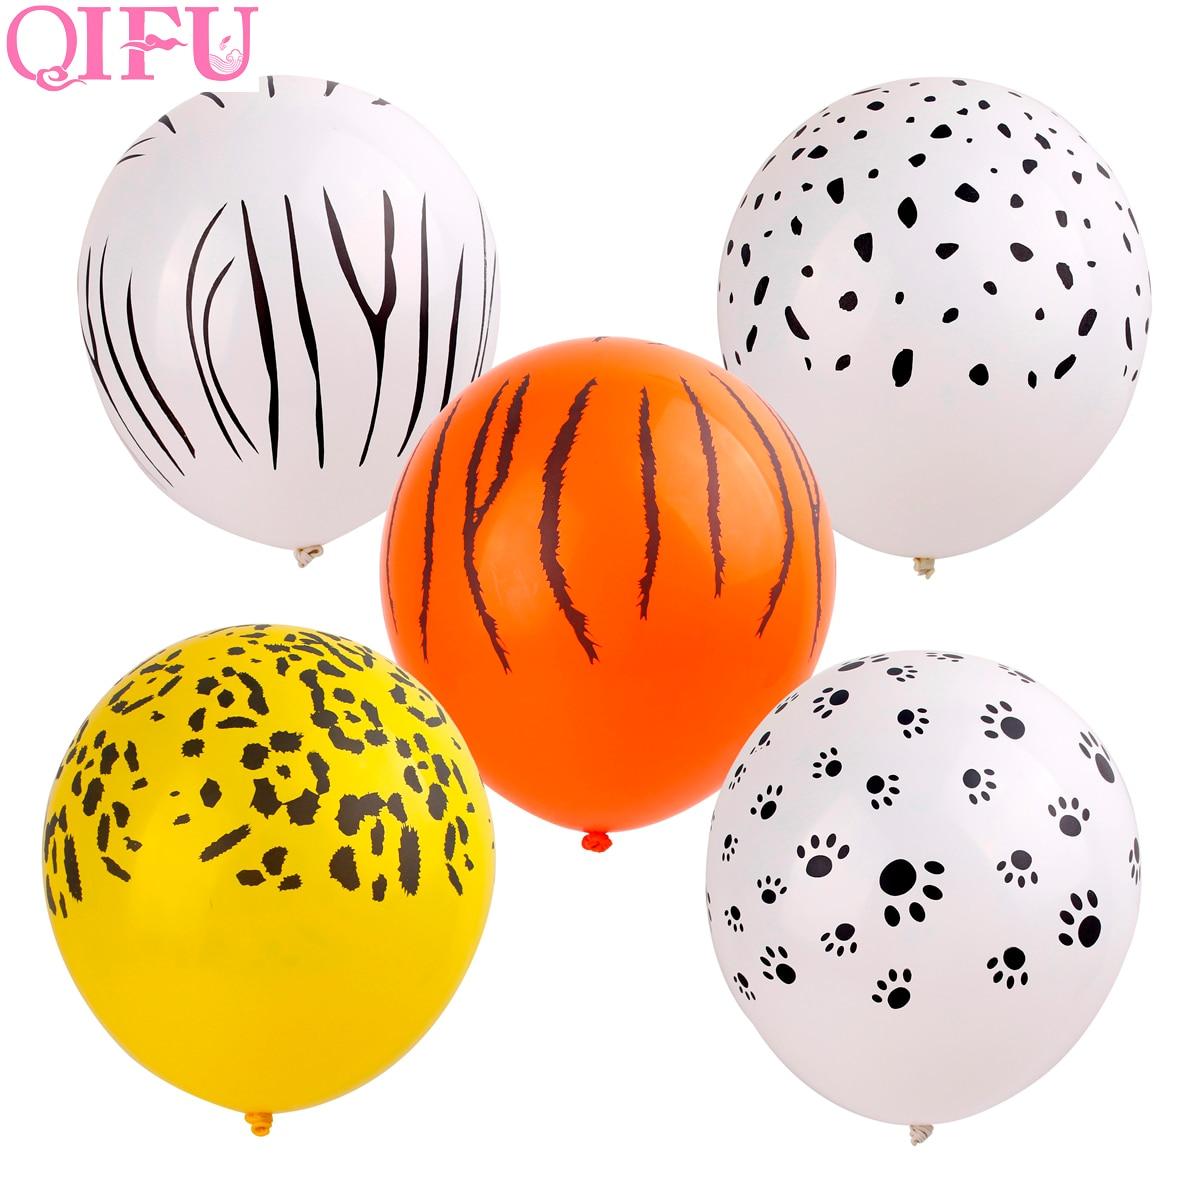 QIFU Latex Animal Balloons Birthday Jungle Party Safari Theme Baloon Decorations Kid